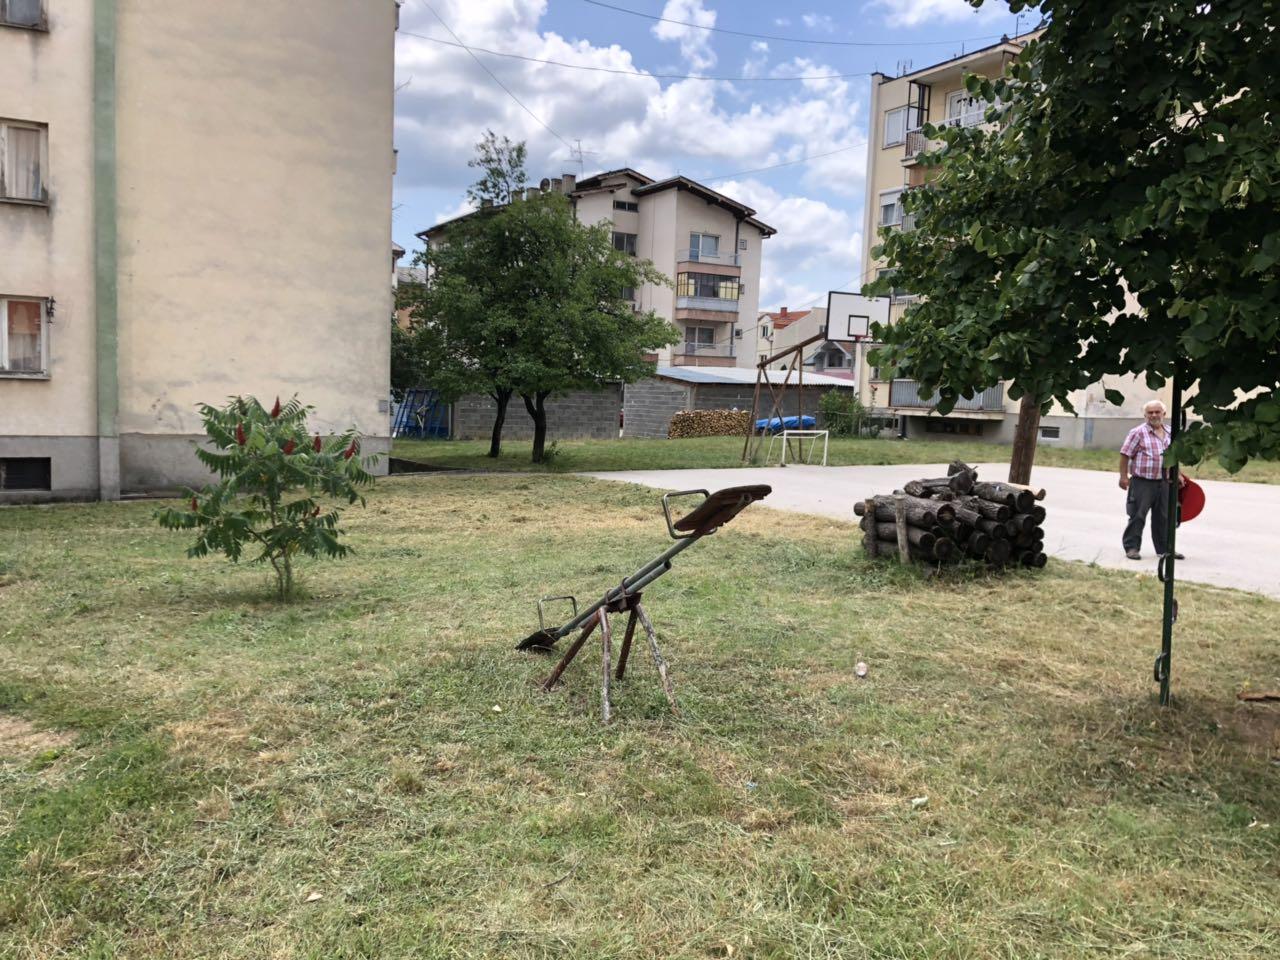 Naselje Saraj dobija nove klupe i klackalice